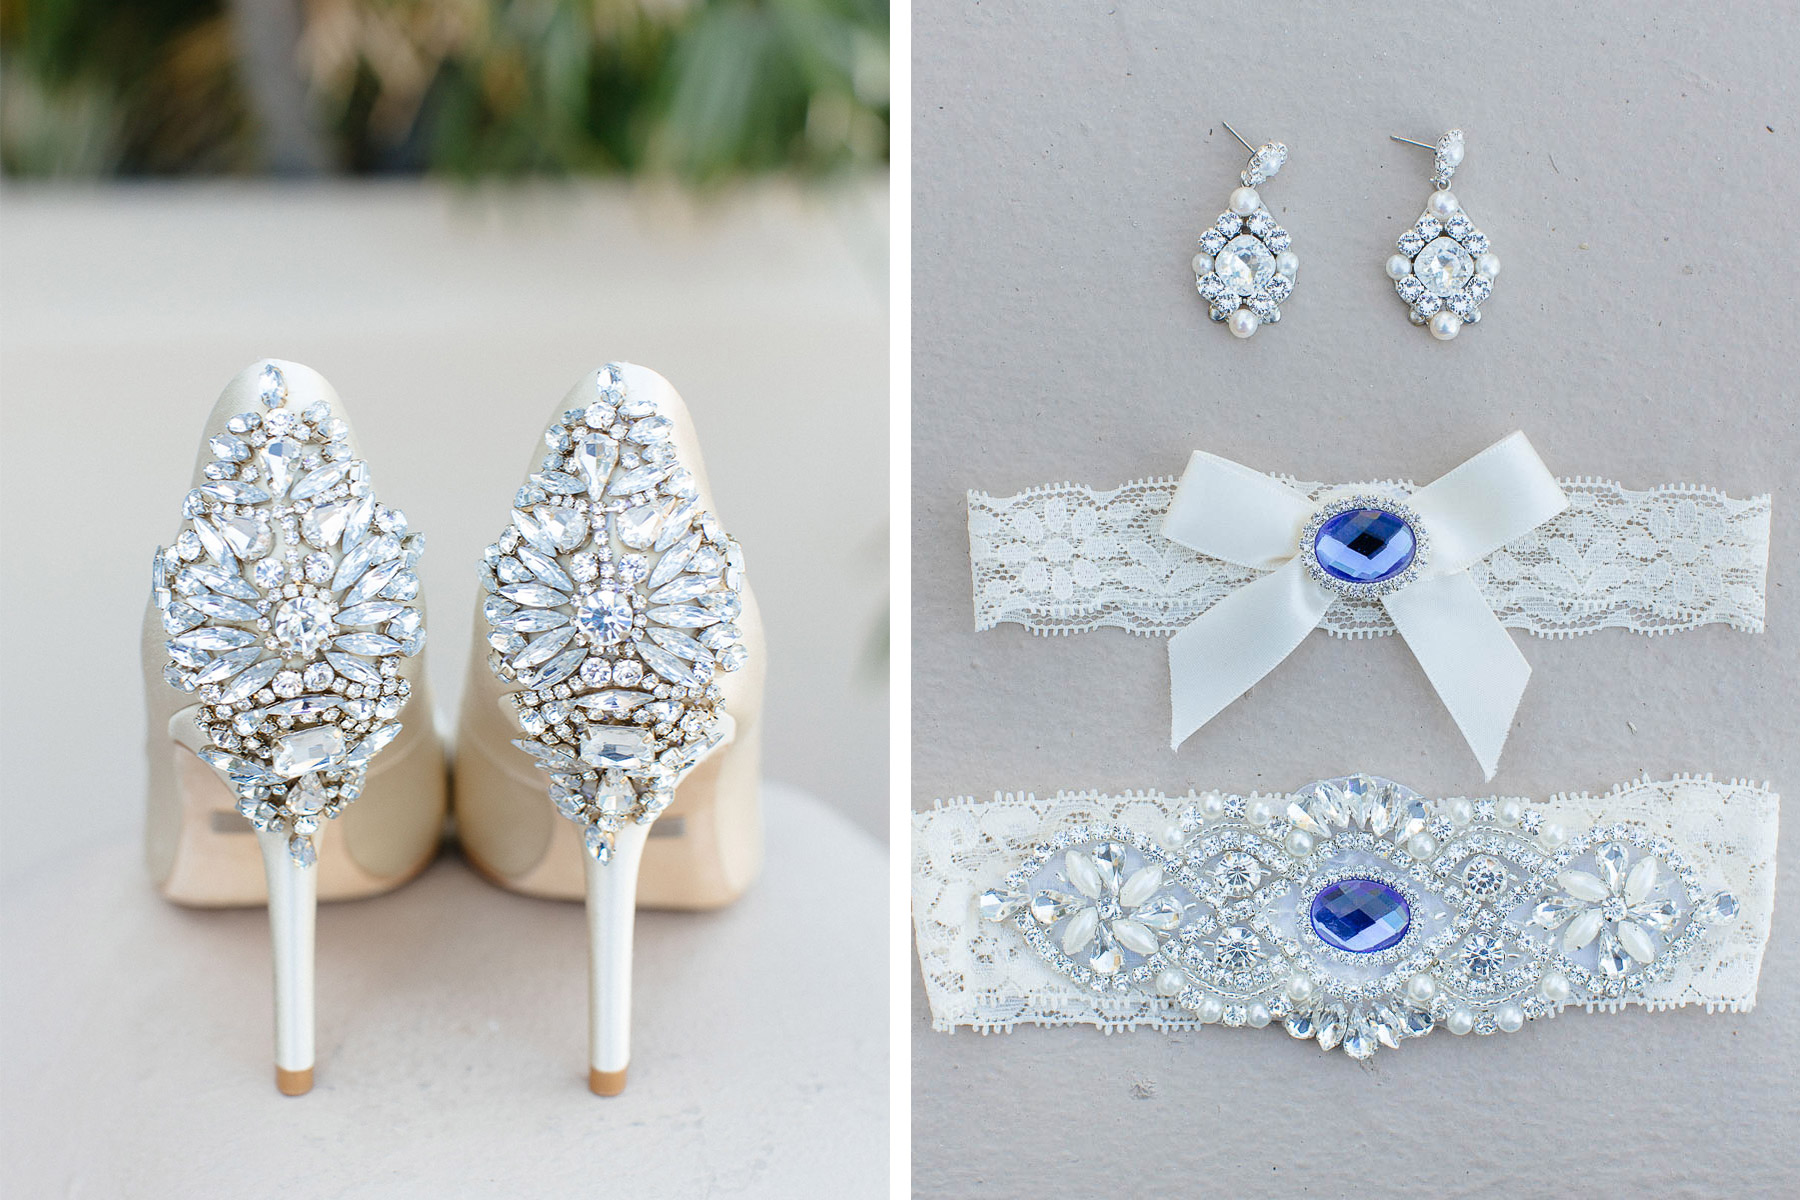 161029-Luxium-Weddings-Arizona-Jeff-Griselda-First-Look-Val-Vista-Lakes-Gilber-001a.jpg